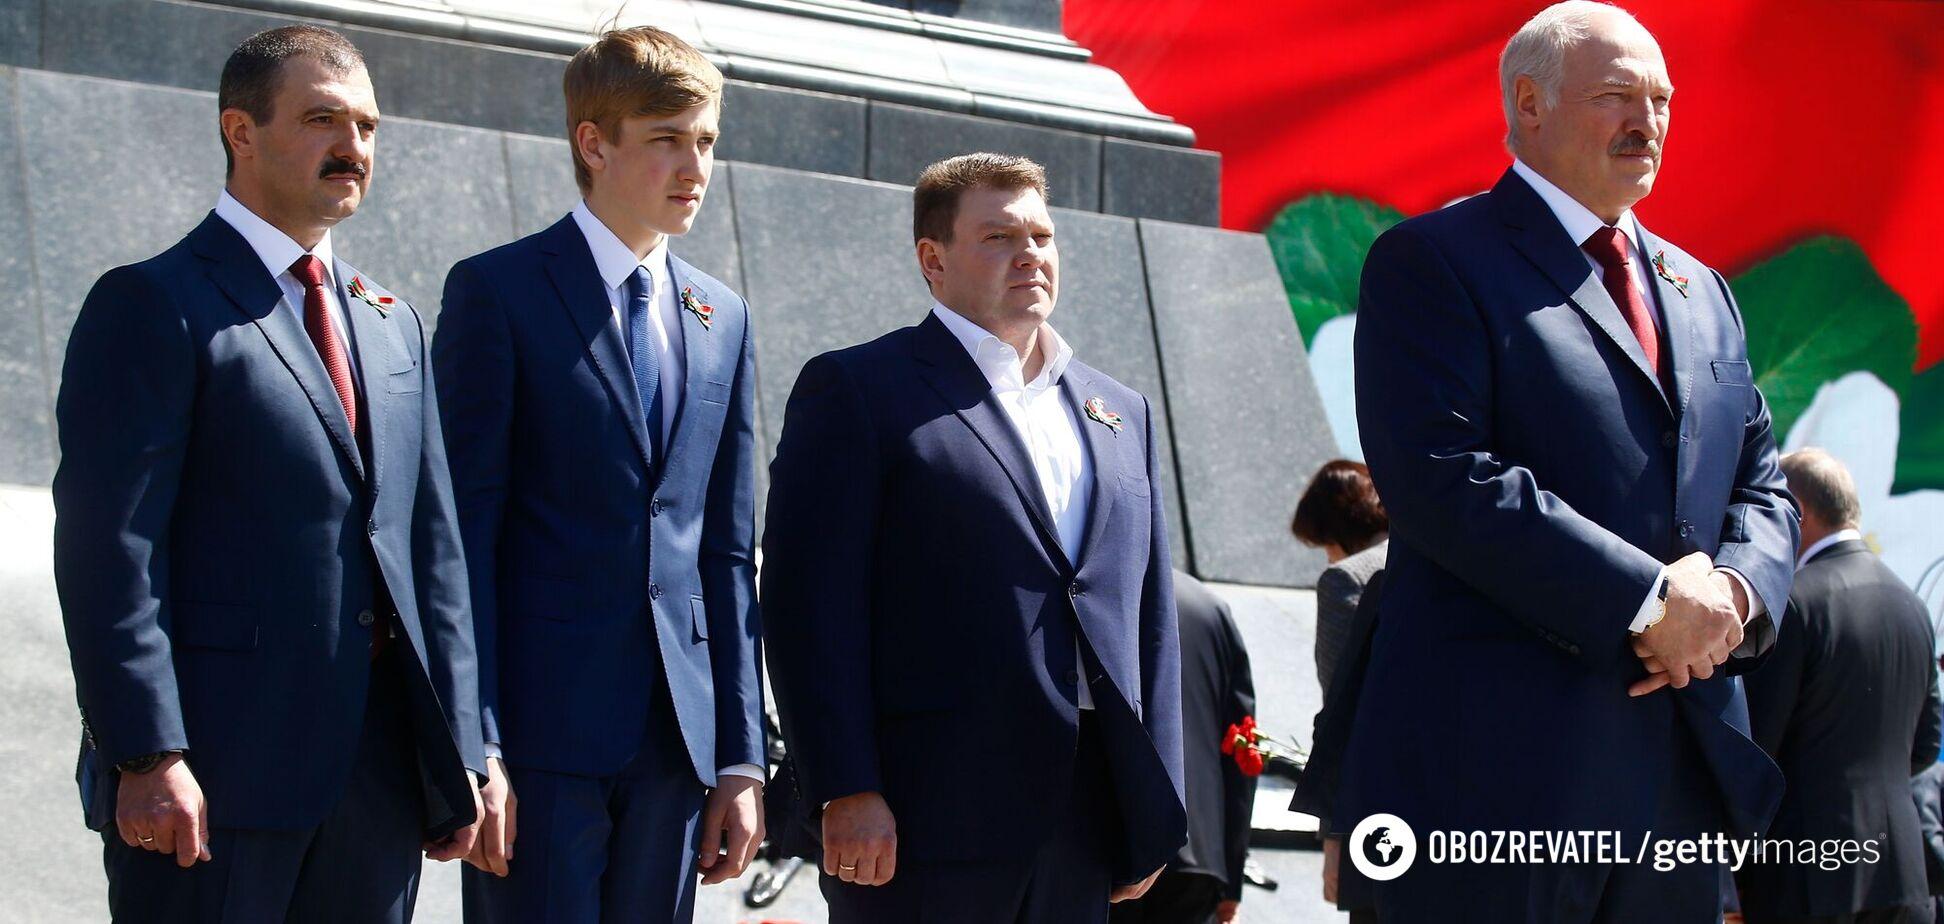 Син Лукашенка